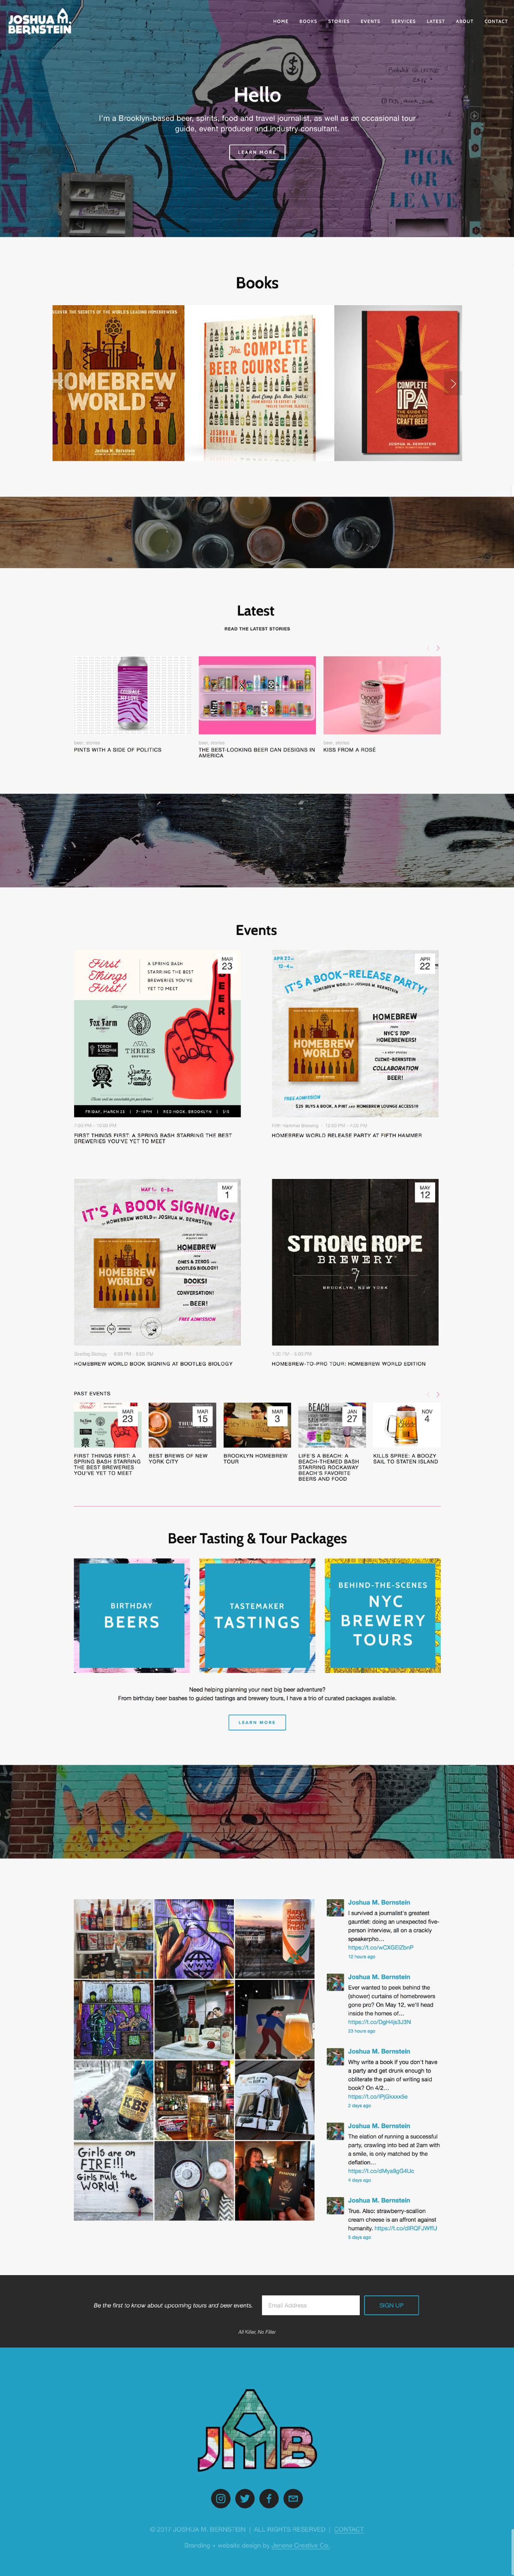 Squarespace website homepage and branding for Joshua M. Bernstein